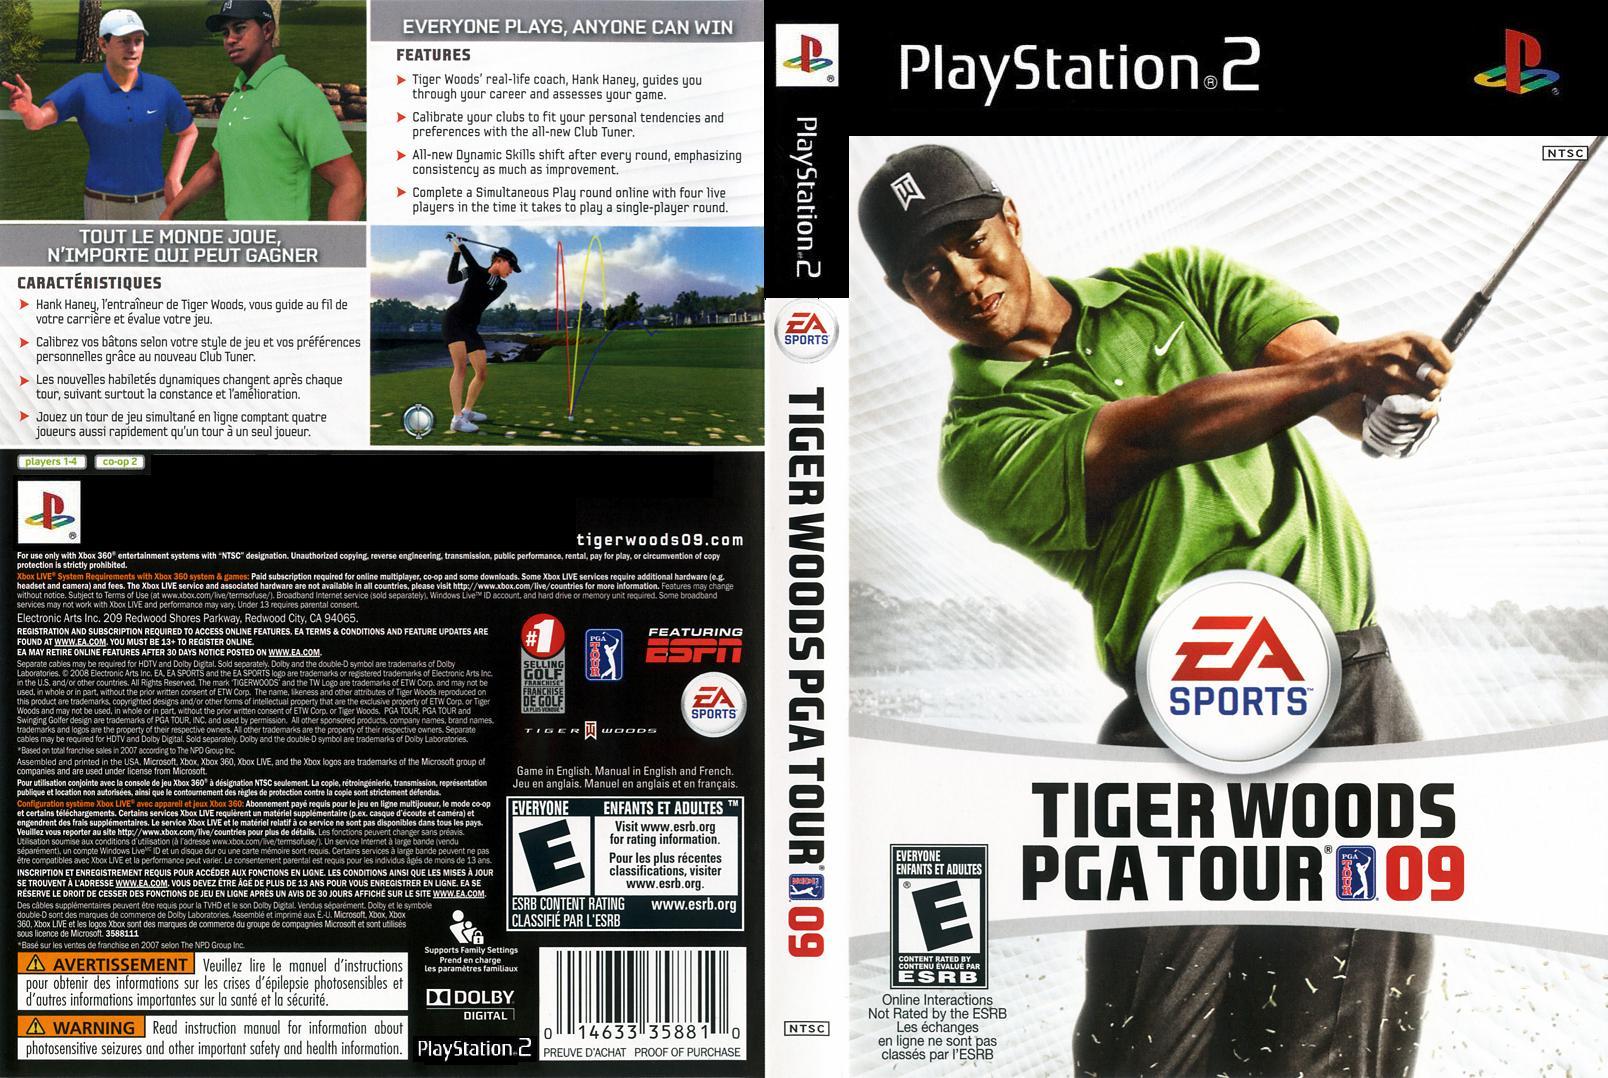 TigerWoodsPGATour09